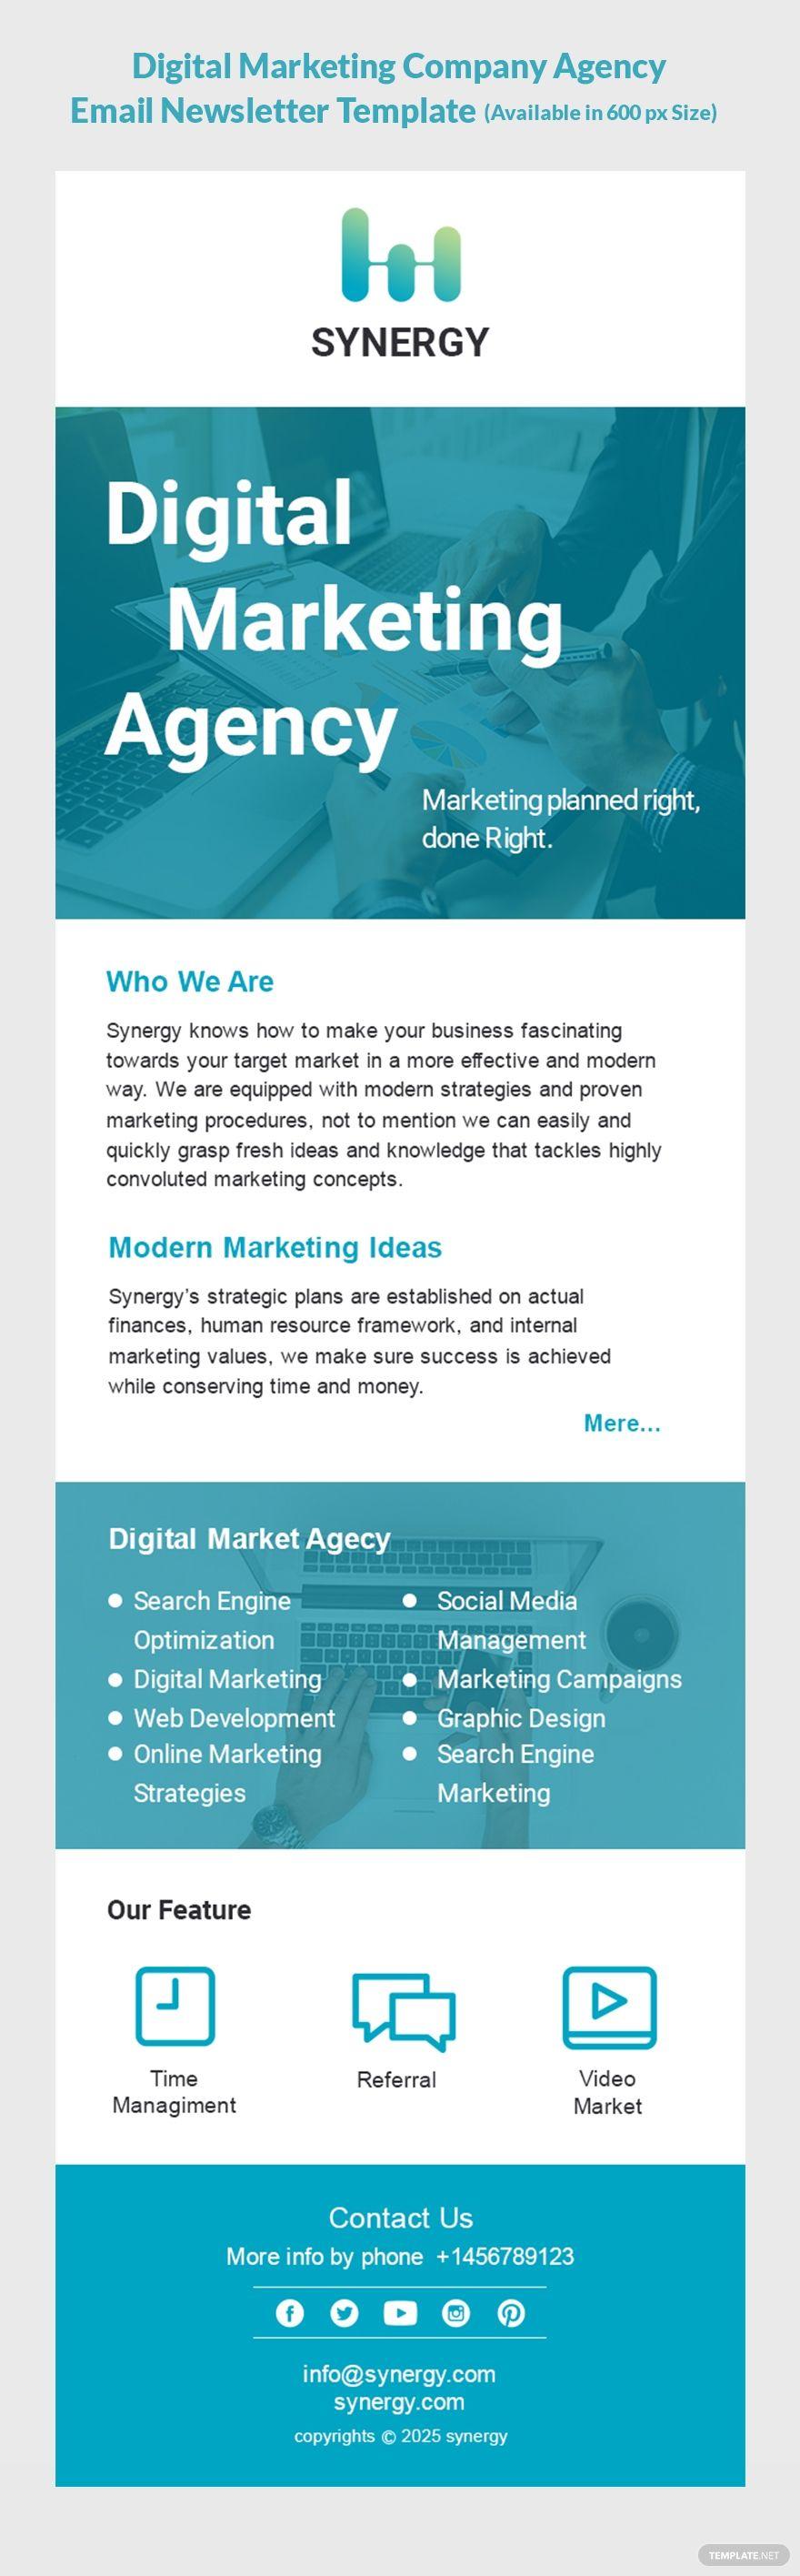 Digital Marketing Company Agency Email Newsletter Template Psd Digital Marketing Strategy Template Digital Marketing Email Newsletter Template